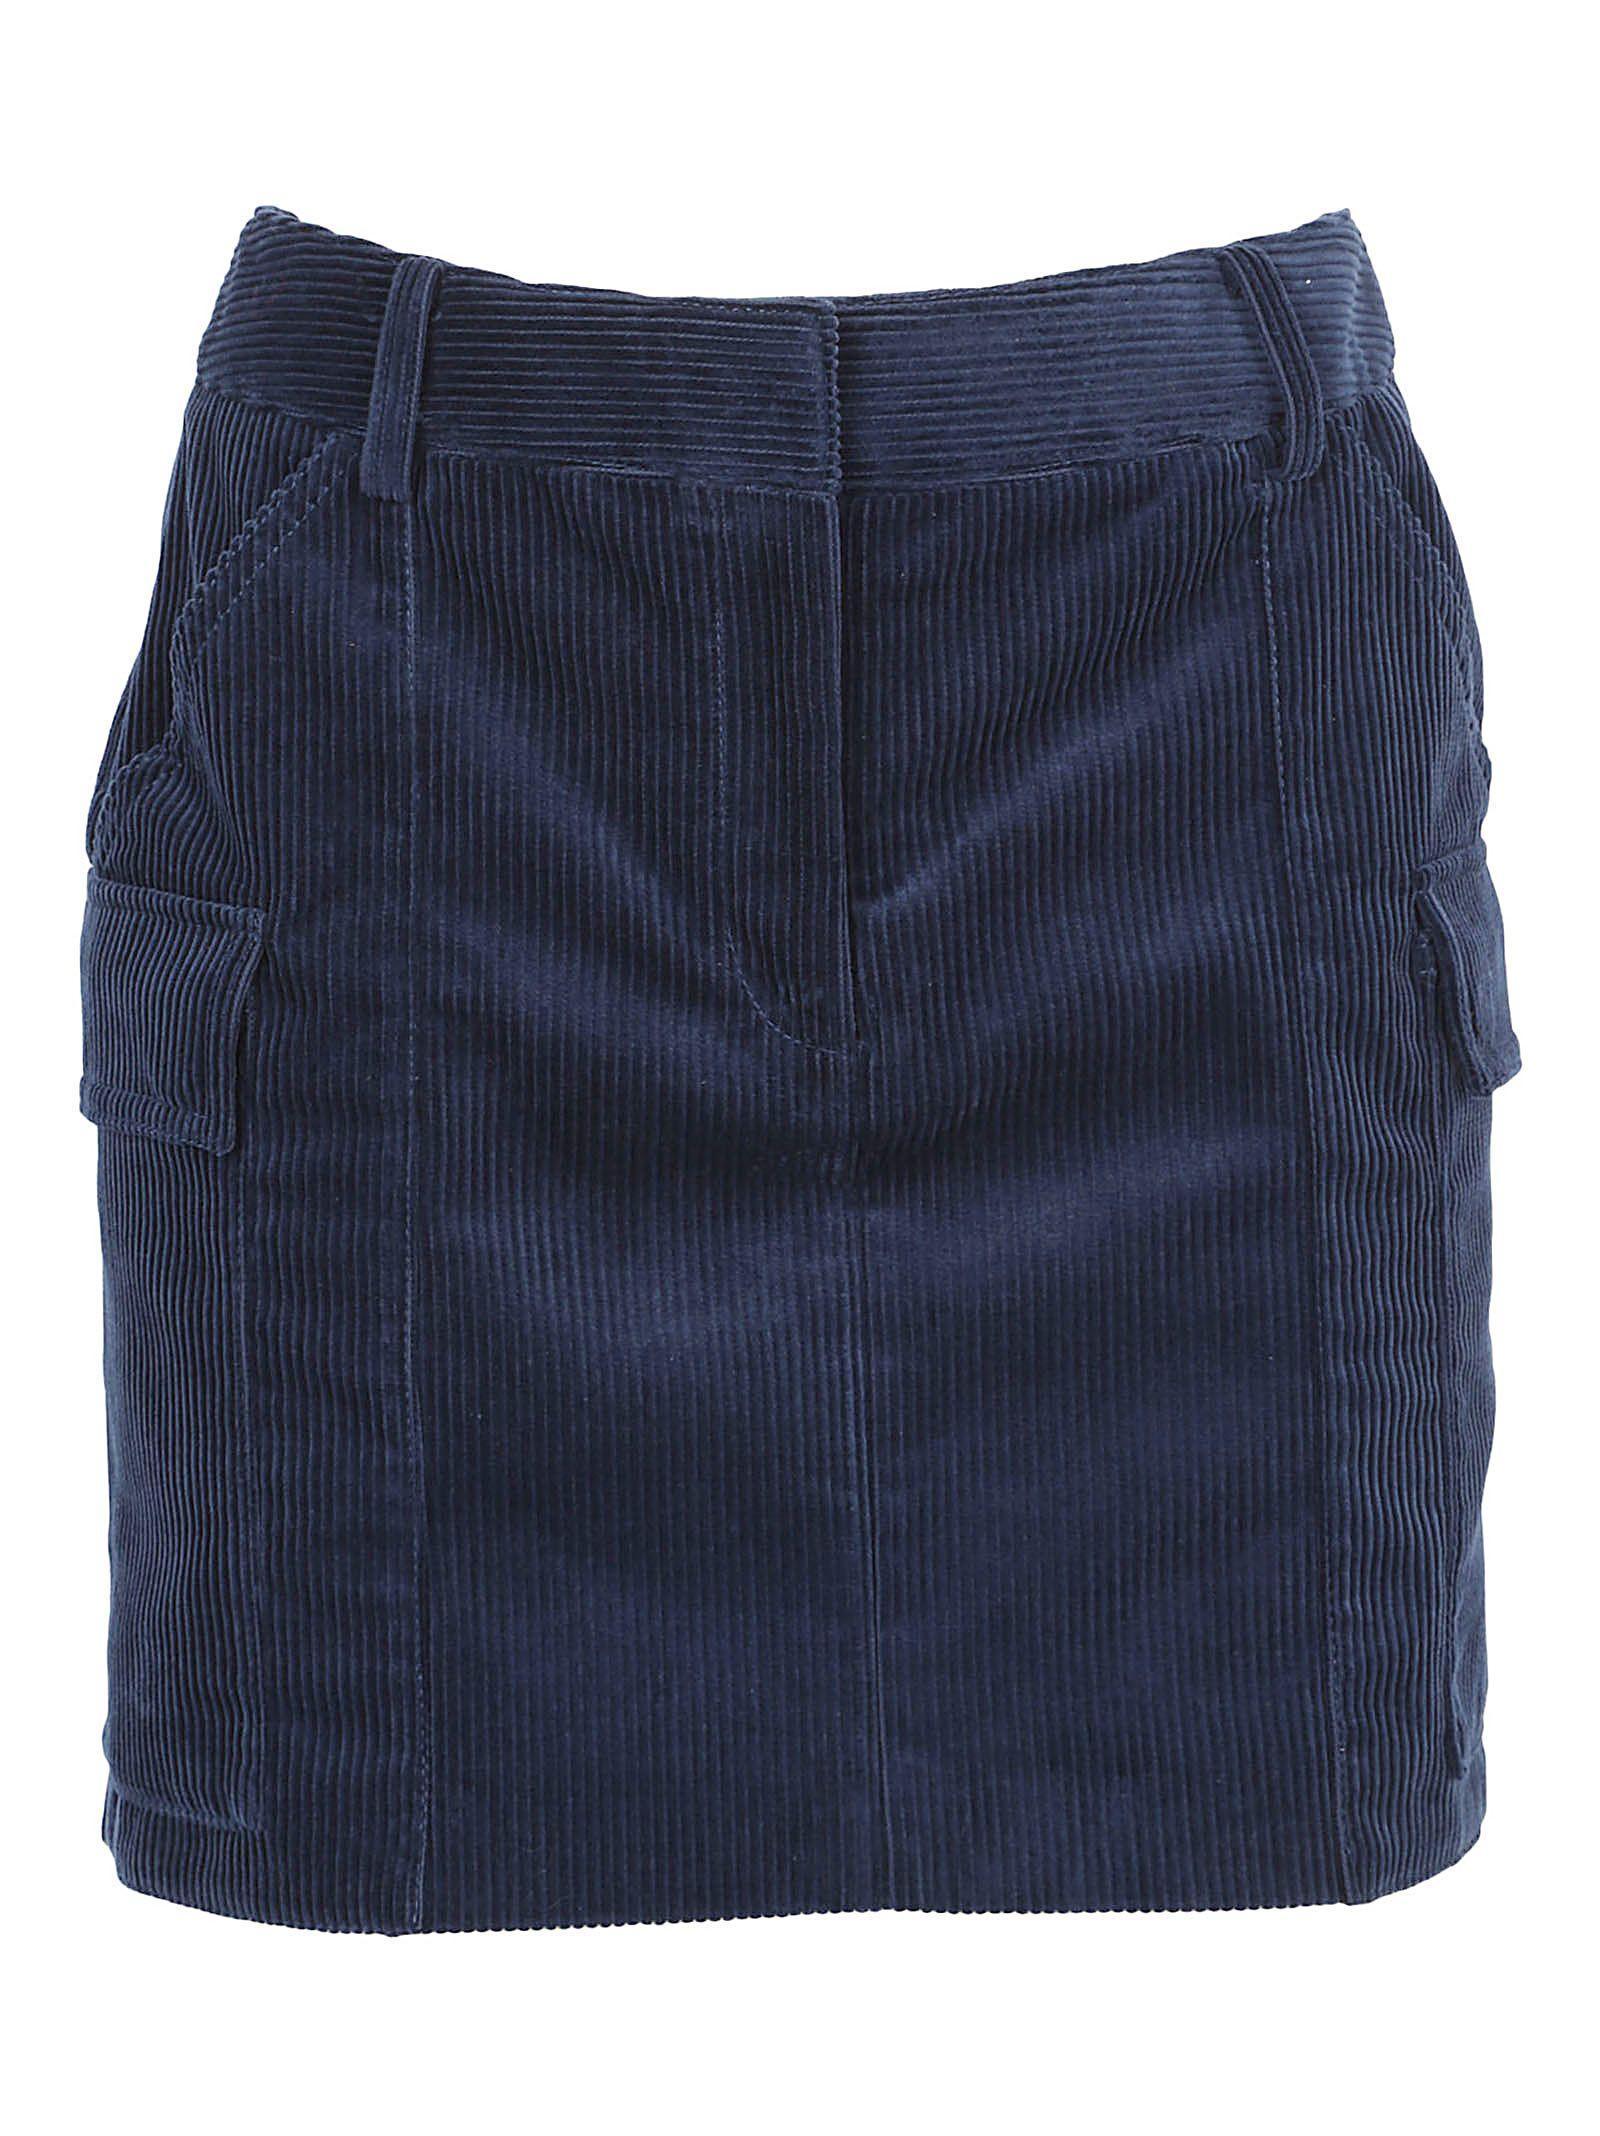 Stella Mccartney Skirt In Blue Stone